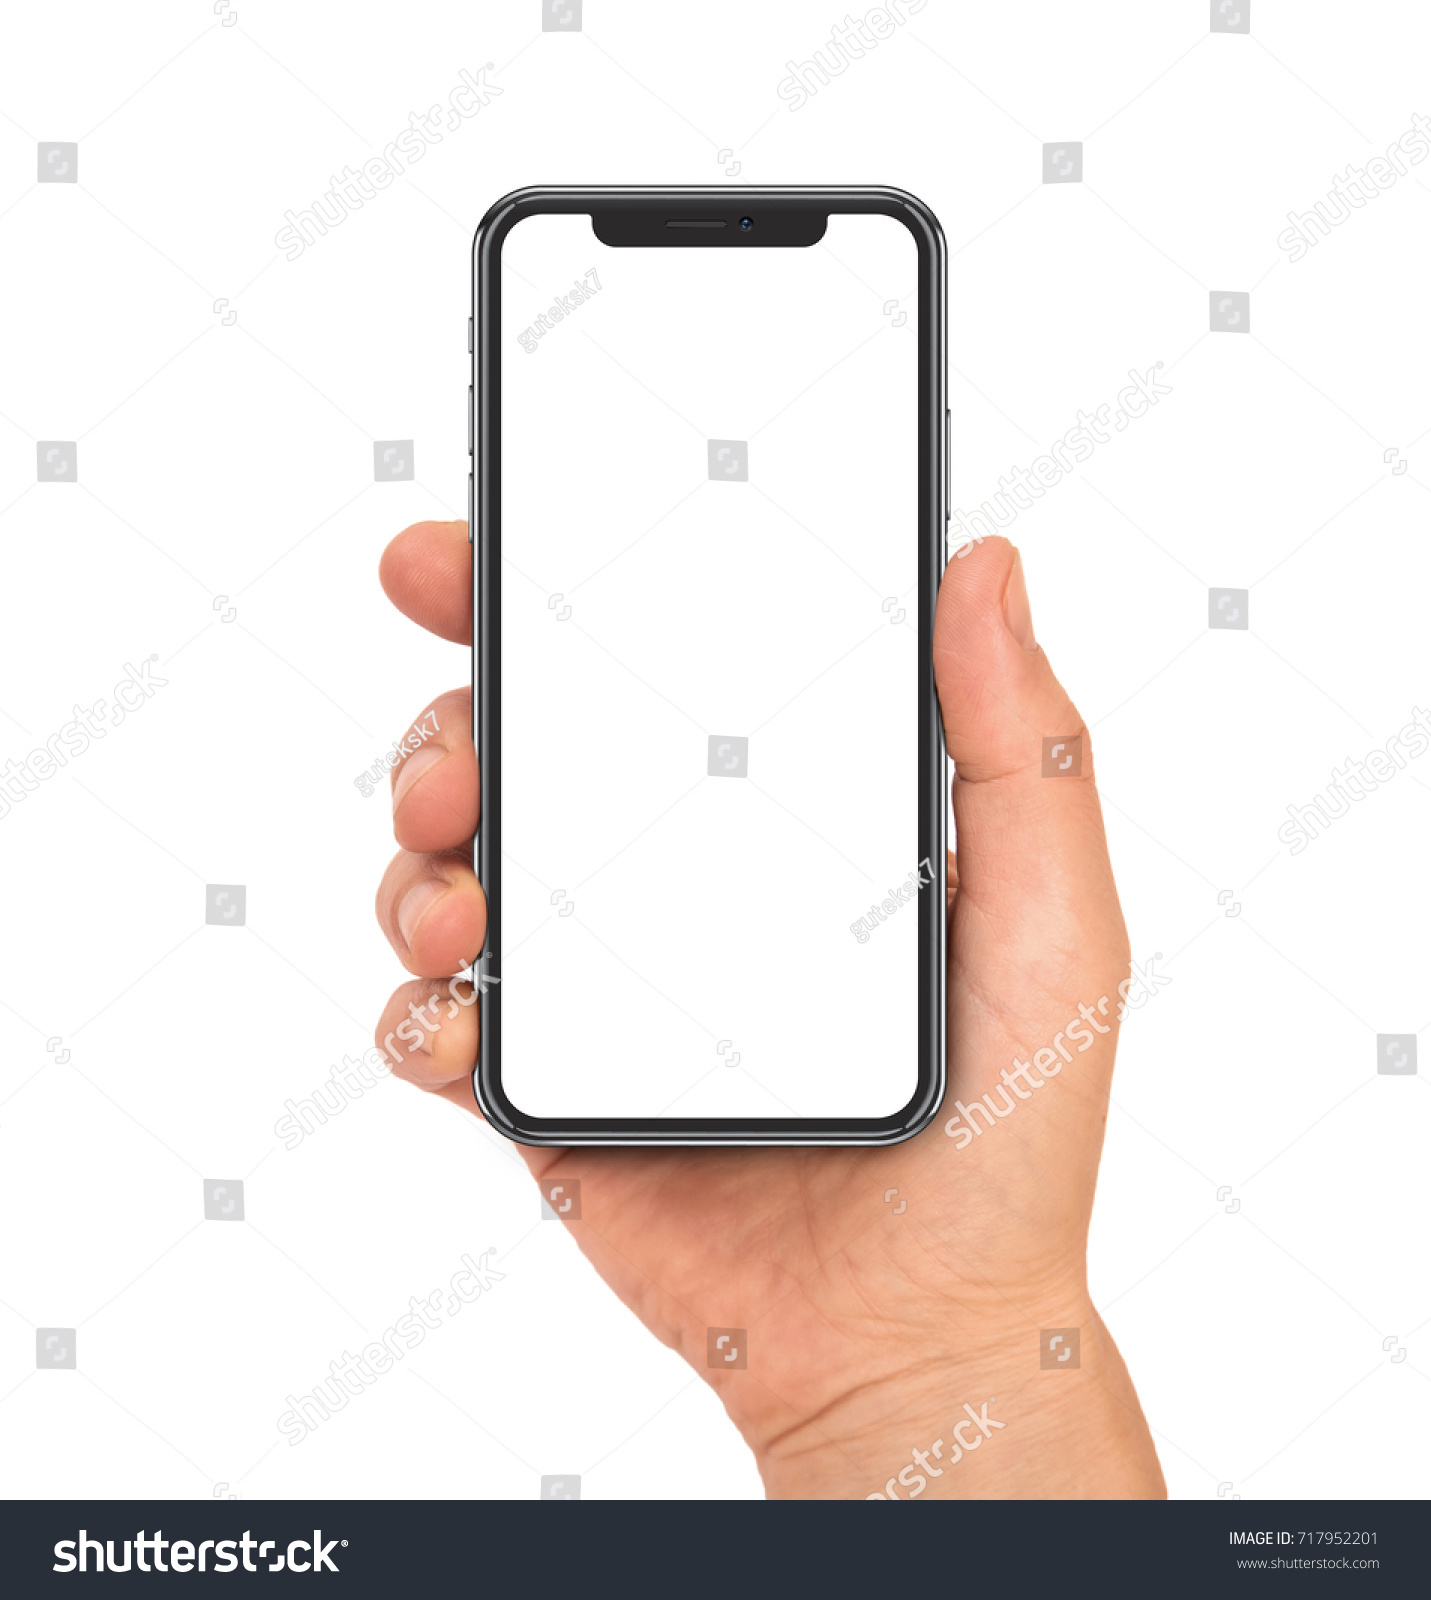 Mobile Frame - Page 5 - Frame Design & Reviews